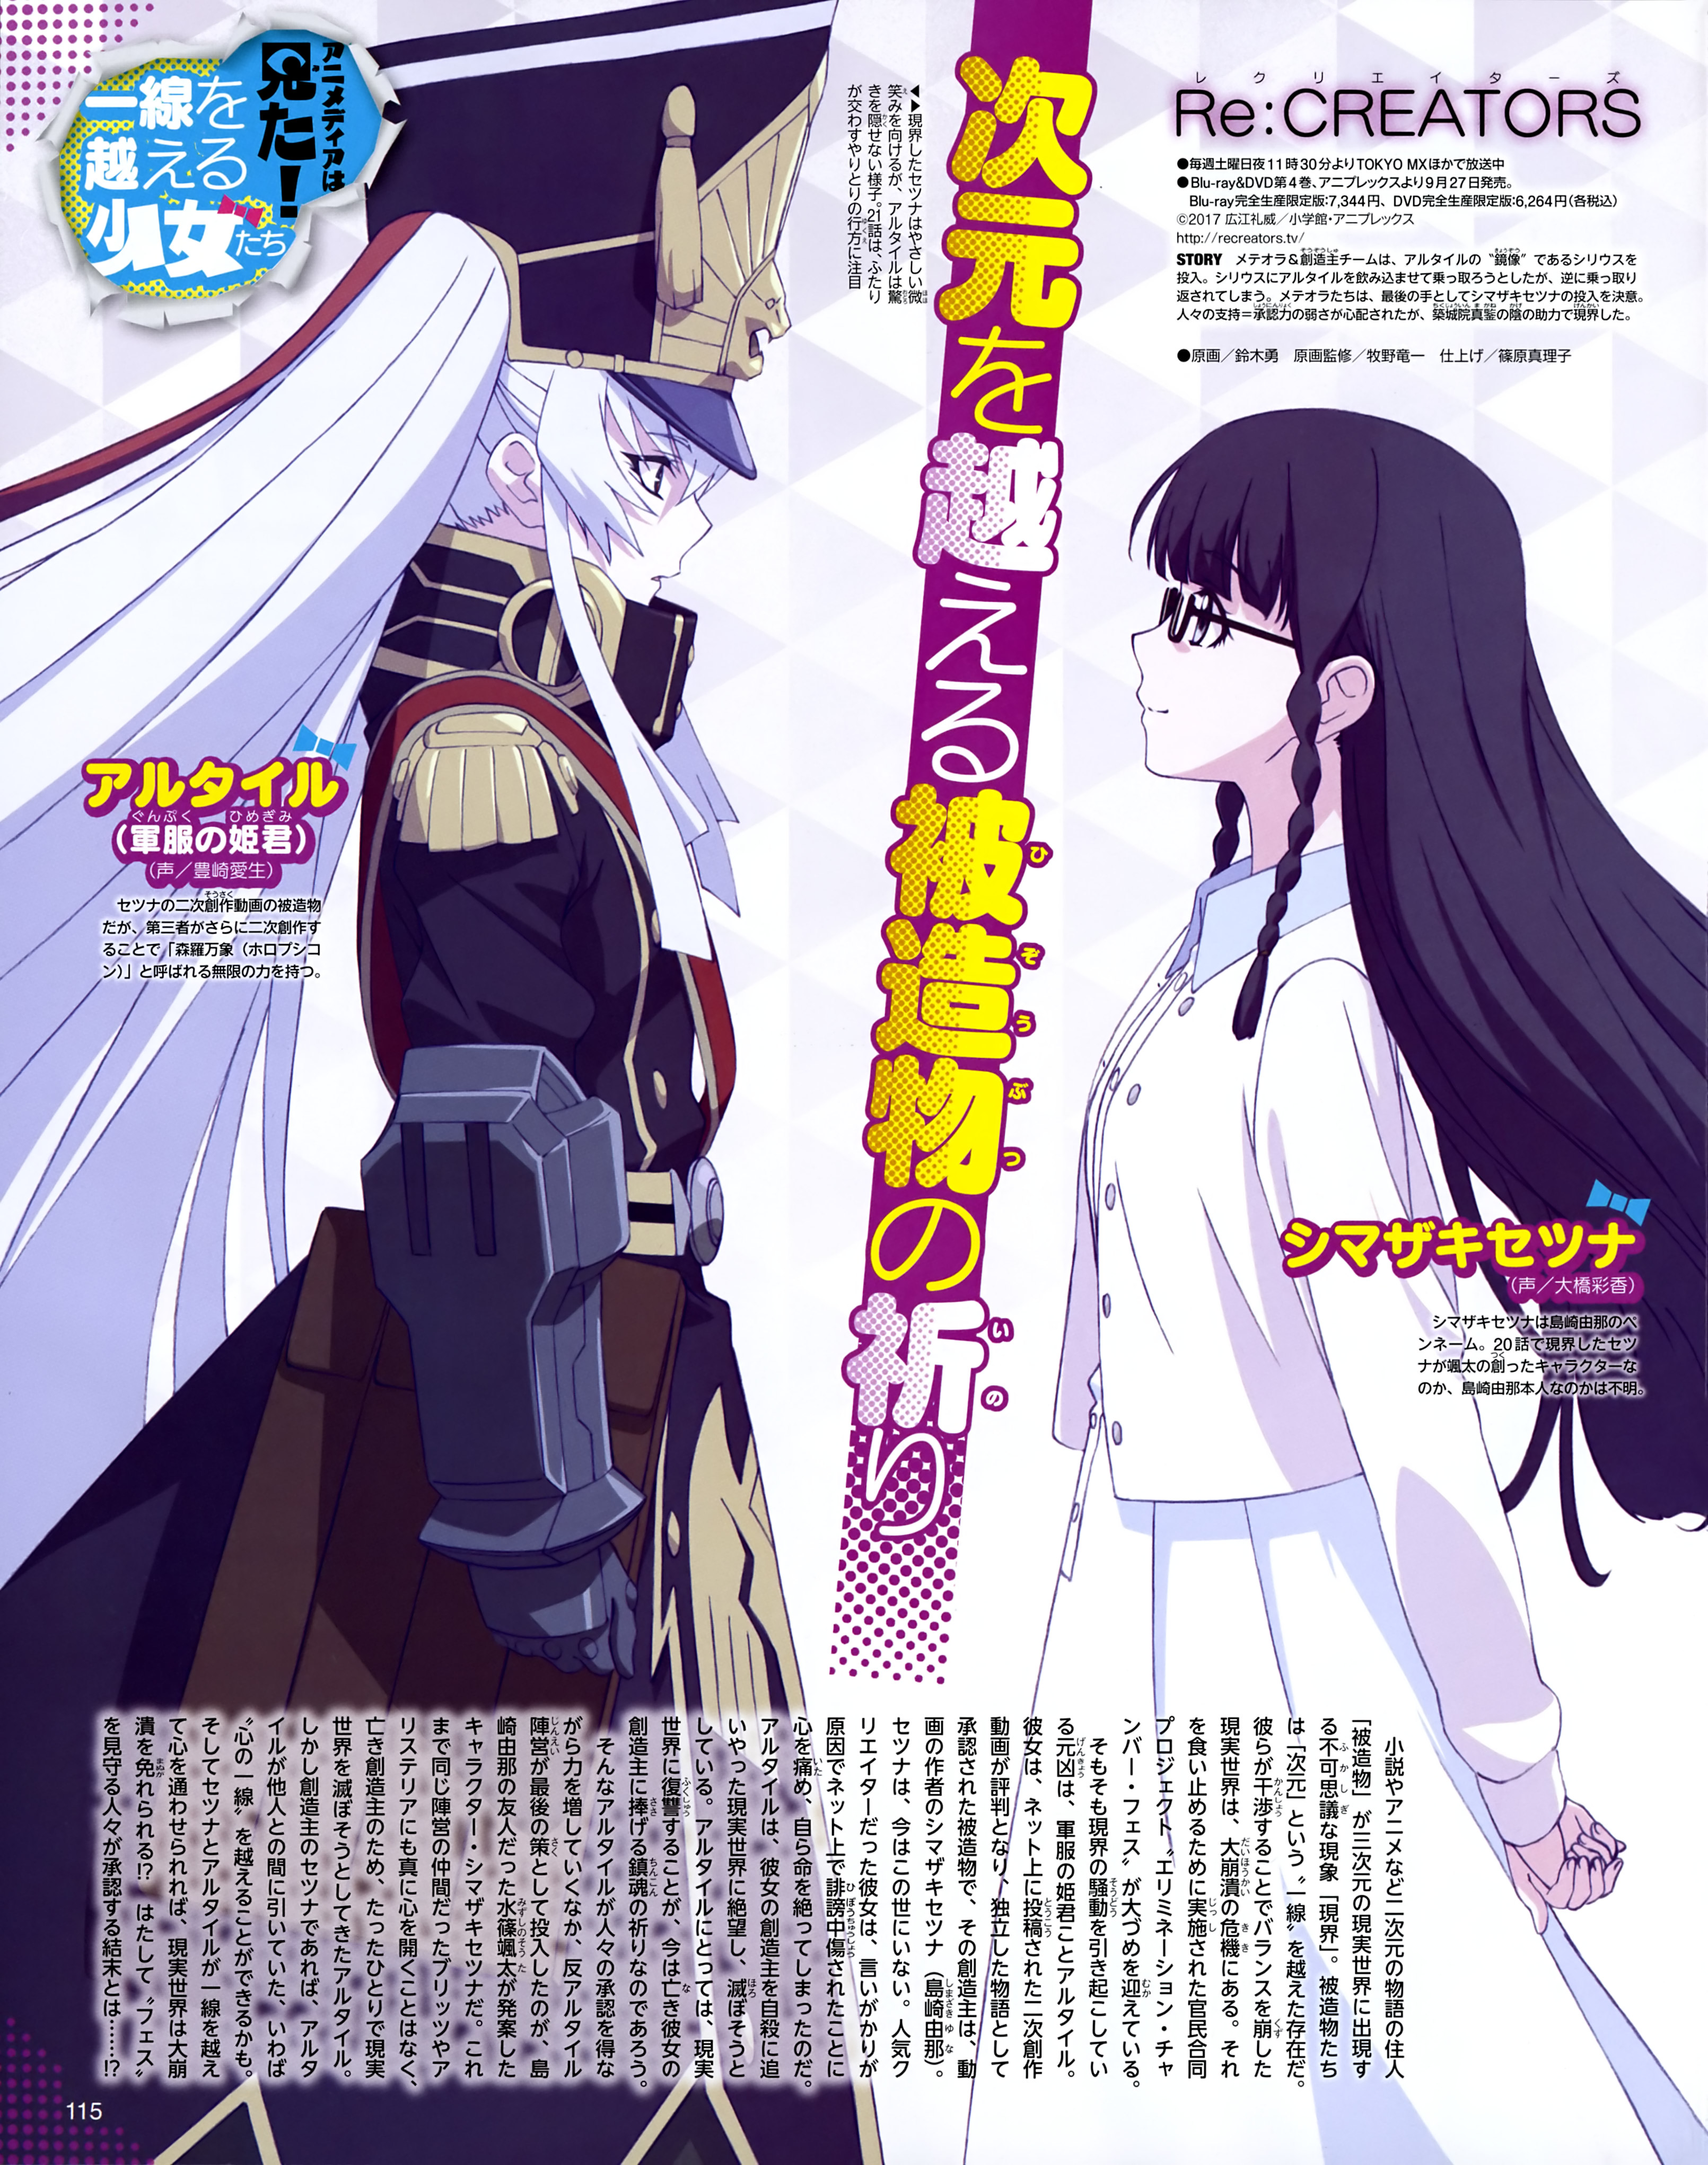 Re:Creators Image #2155078 - Zerochan Anime Image Board